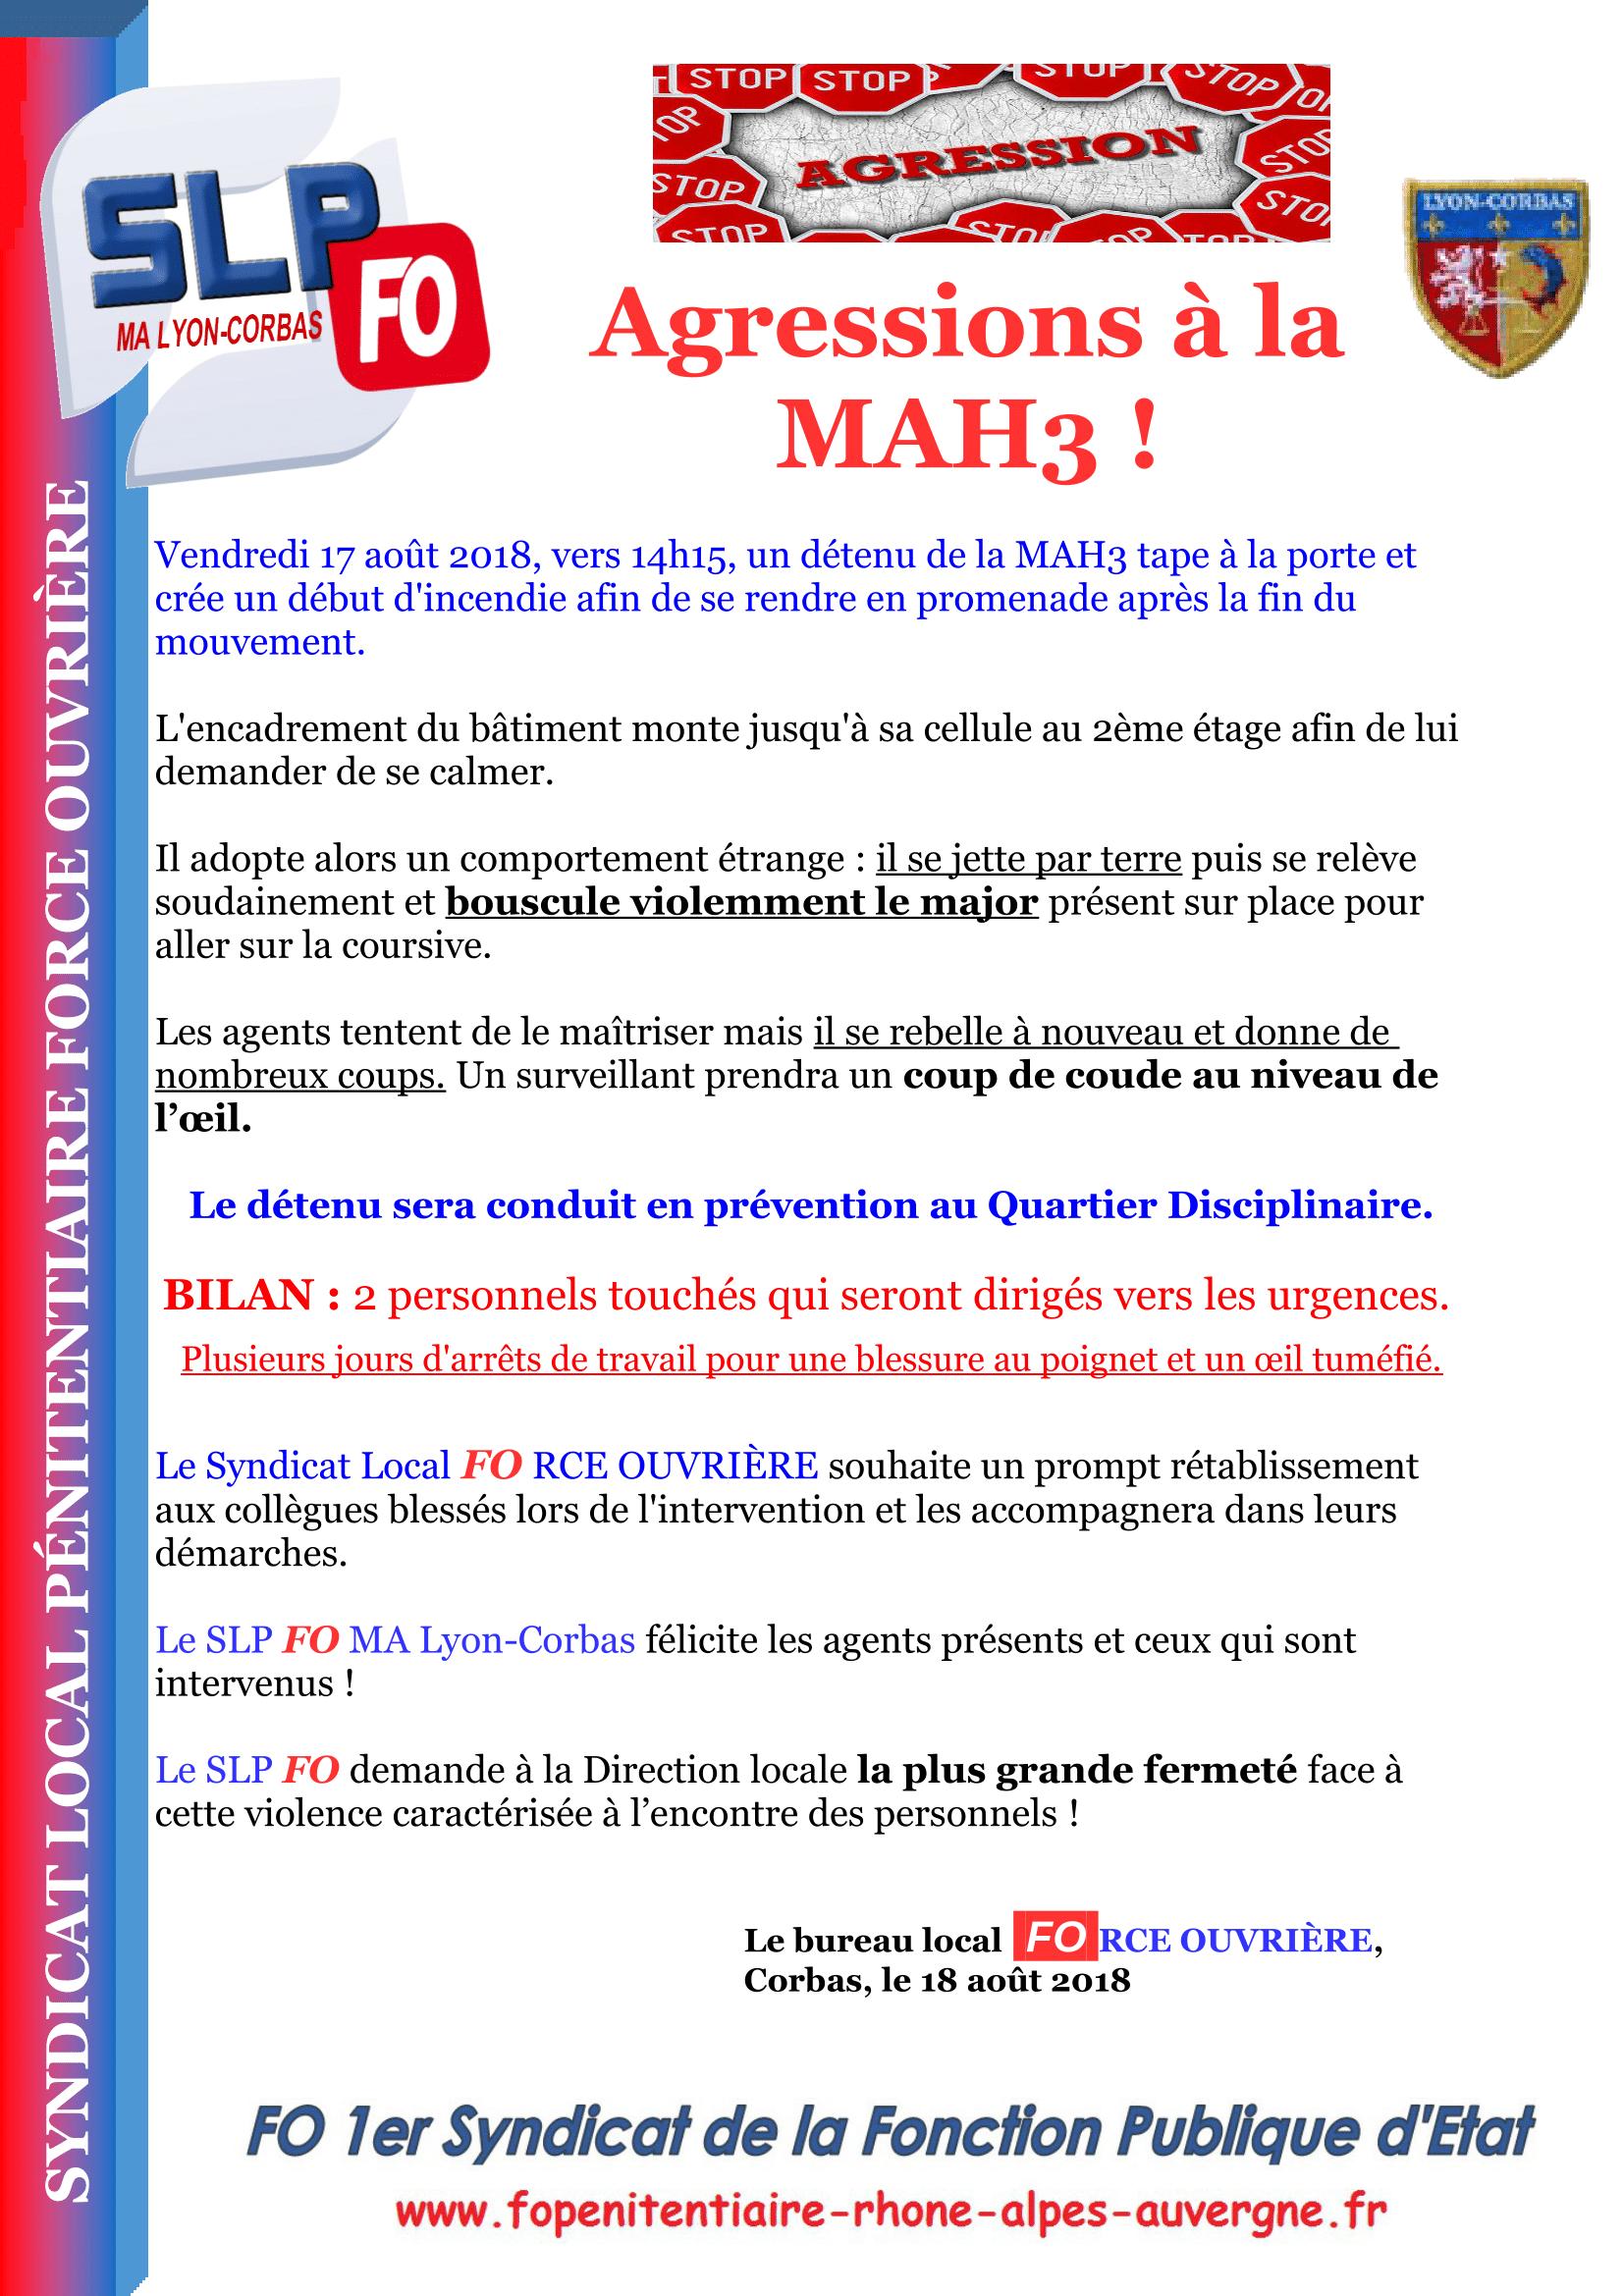 Agressions MAH3-1